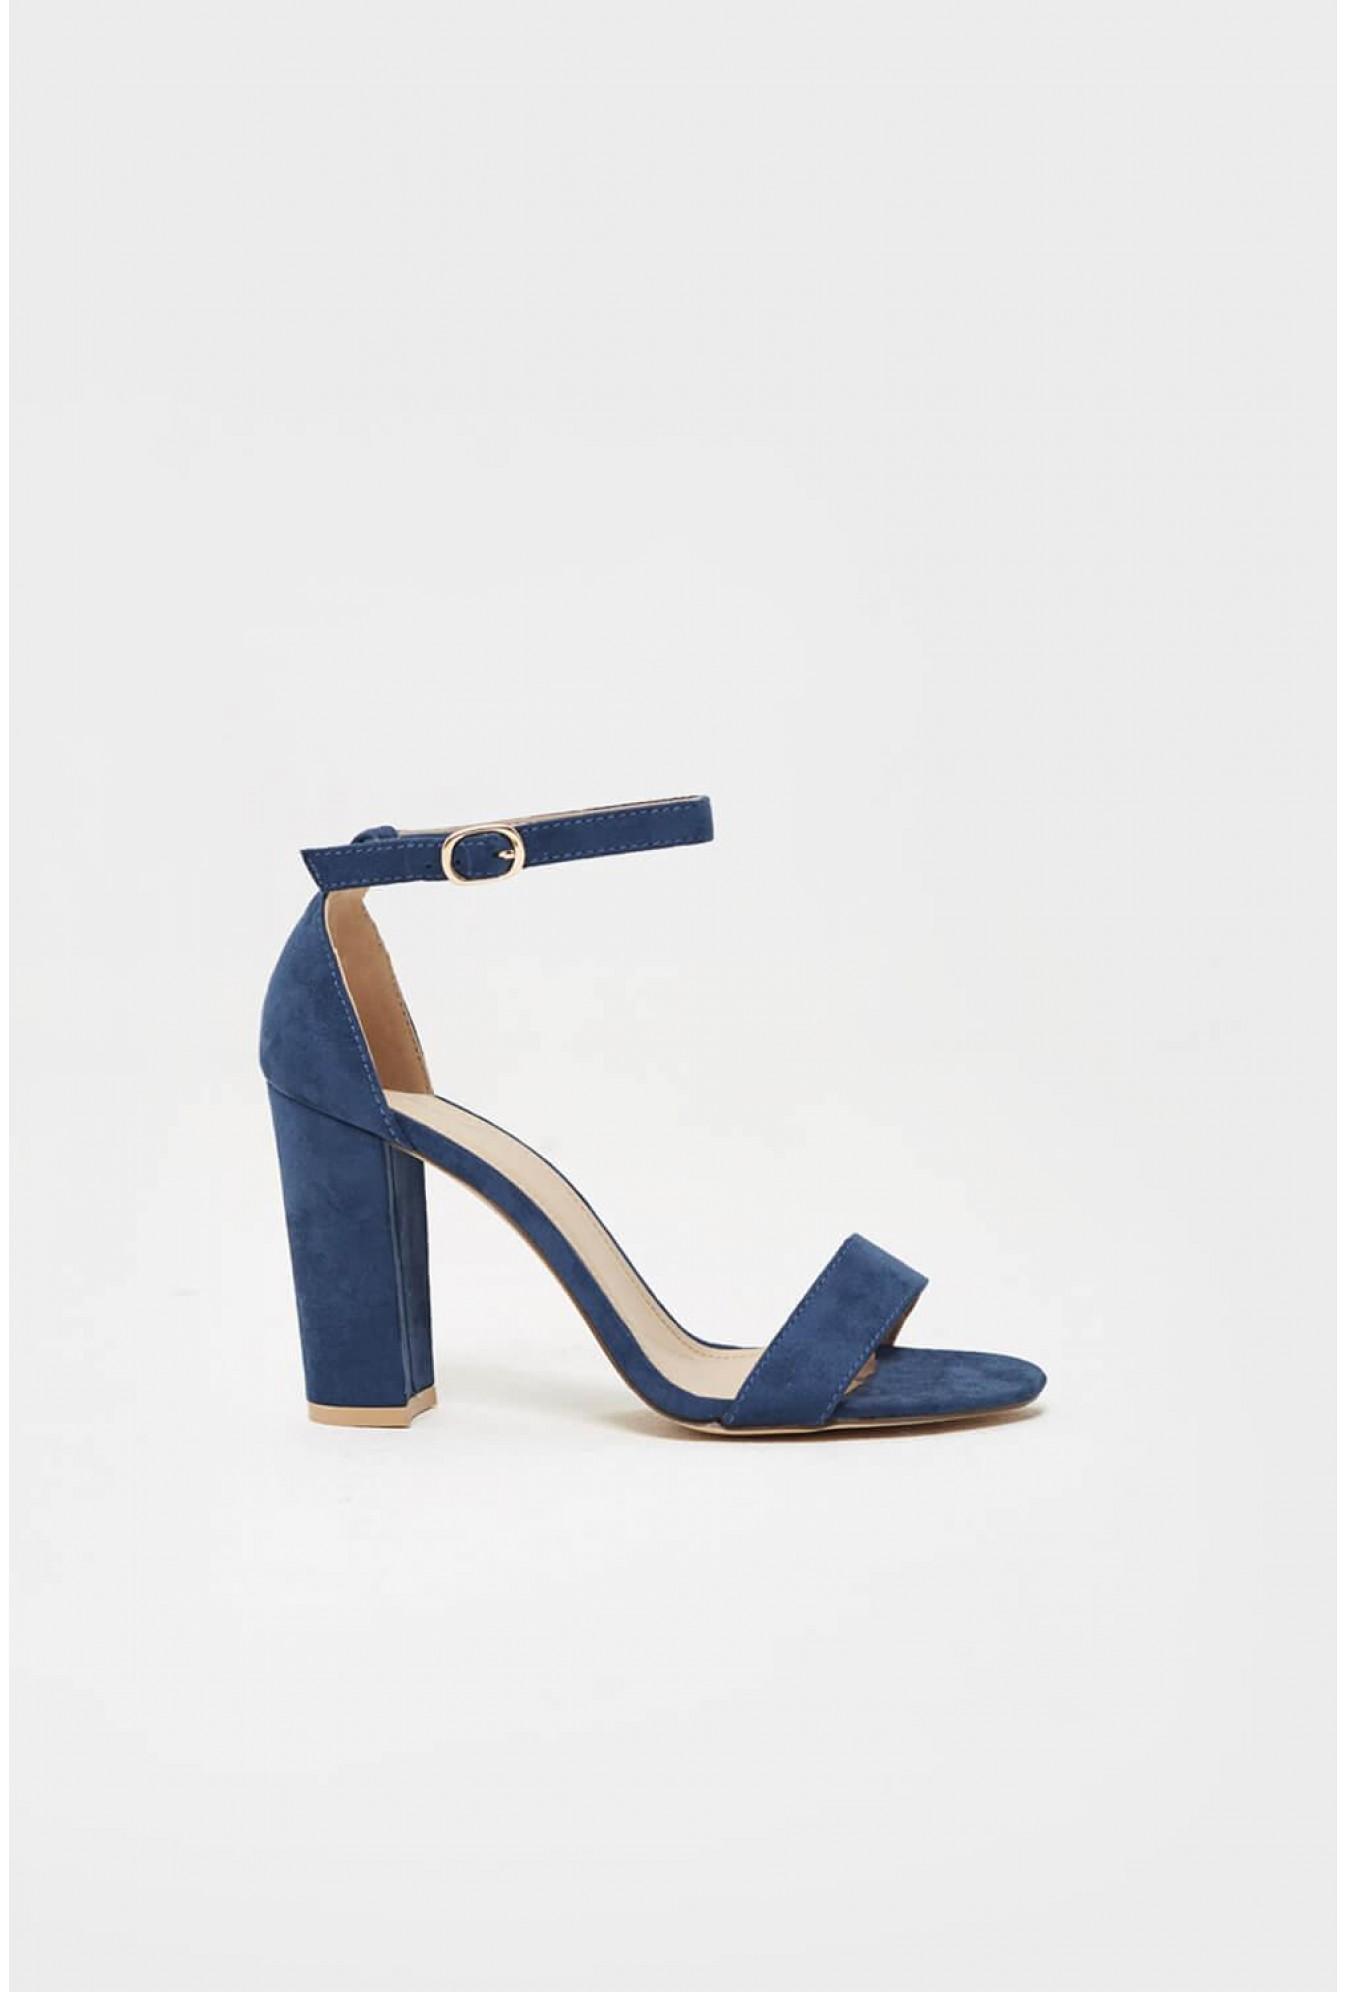 97cbc7d9cffe3 Efashion Paris Troy Block Heel Sandal in Navy Blue   iCLOTHING